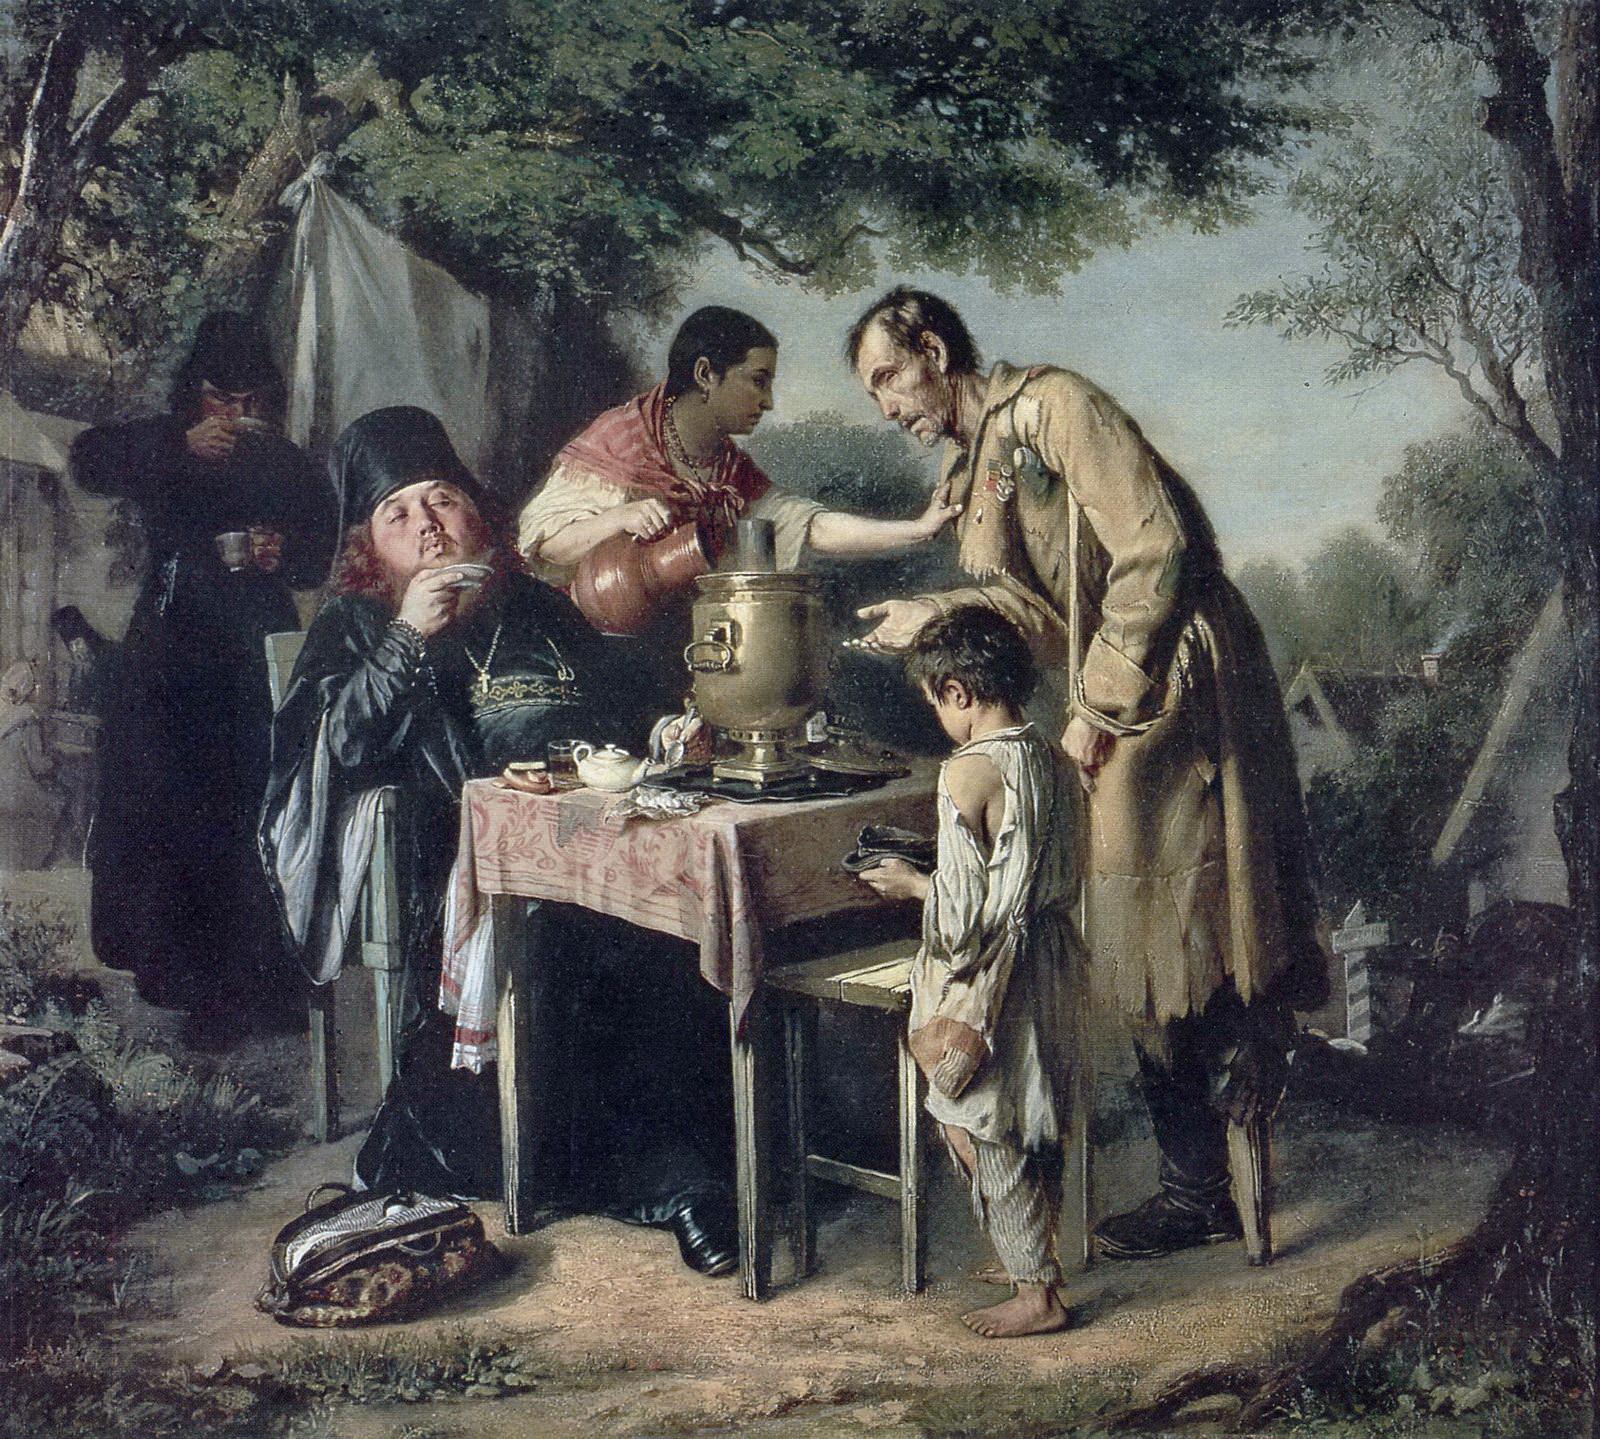 Чаепитие в Мытищах, близ Москвы.  1862 Х., м. 43,5х47,3 ГТГ